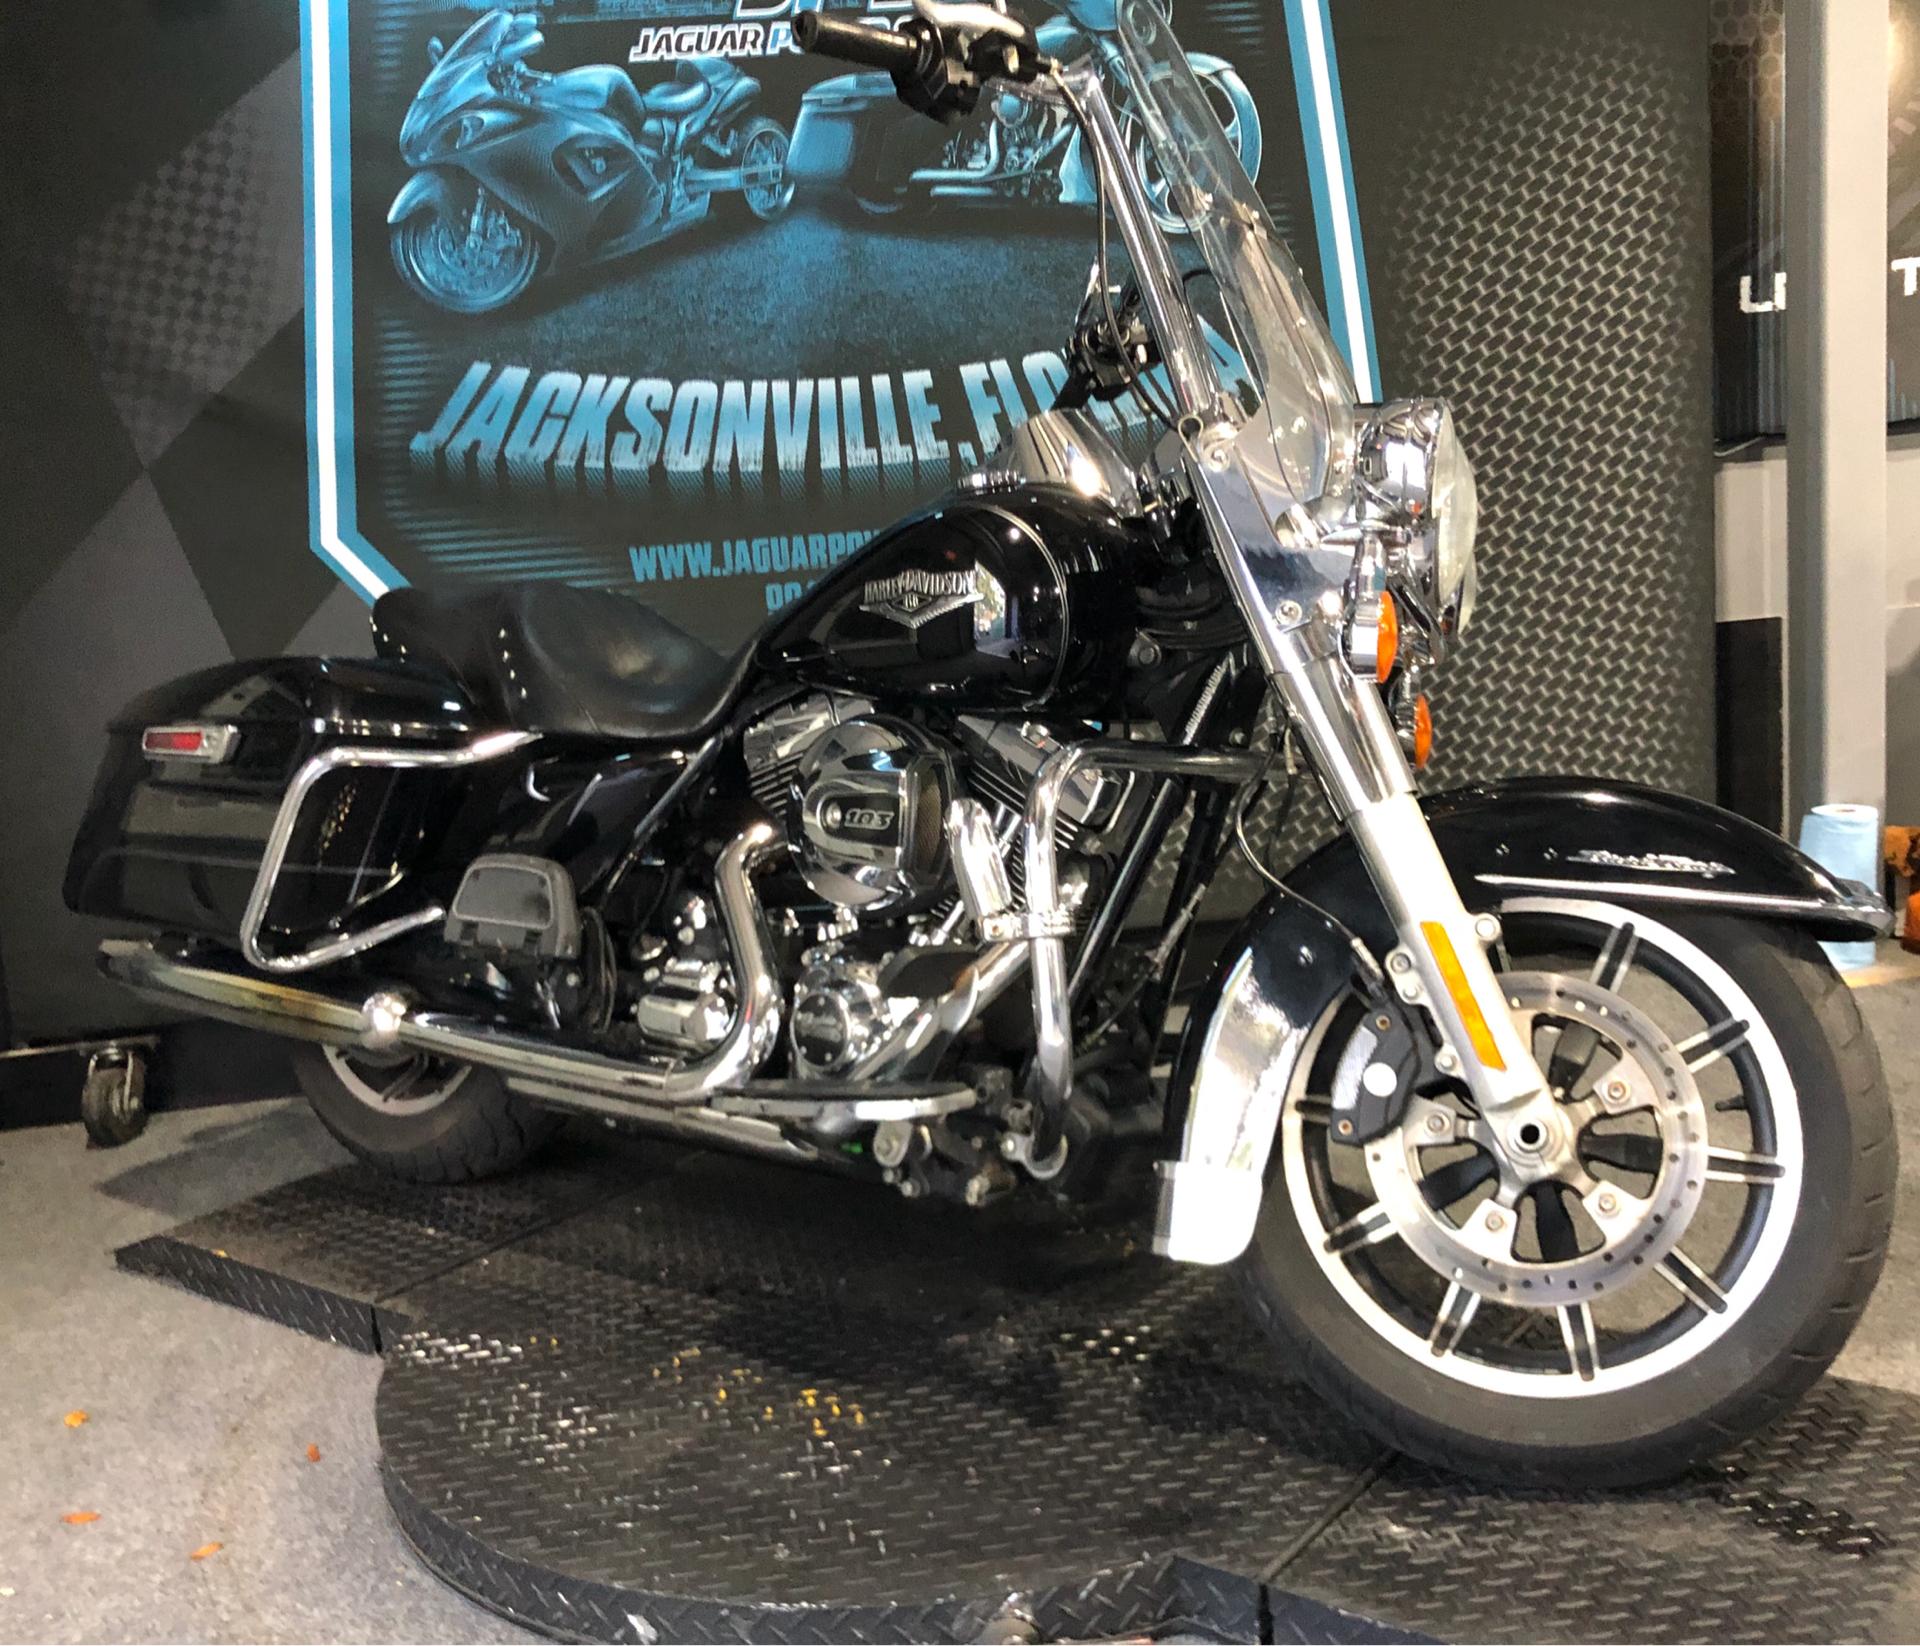 Used 2014 Harley-Davidson Road King® Motorcycles in Jacksonville,